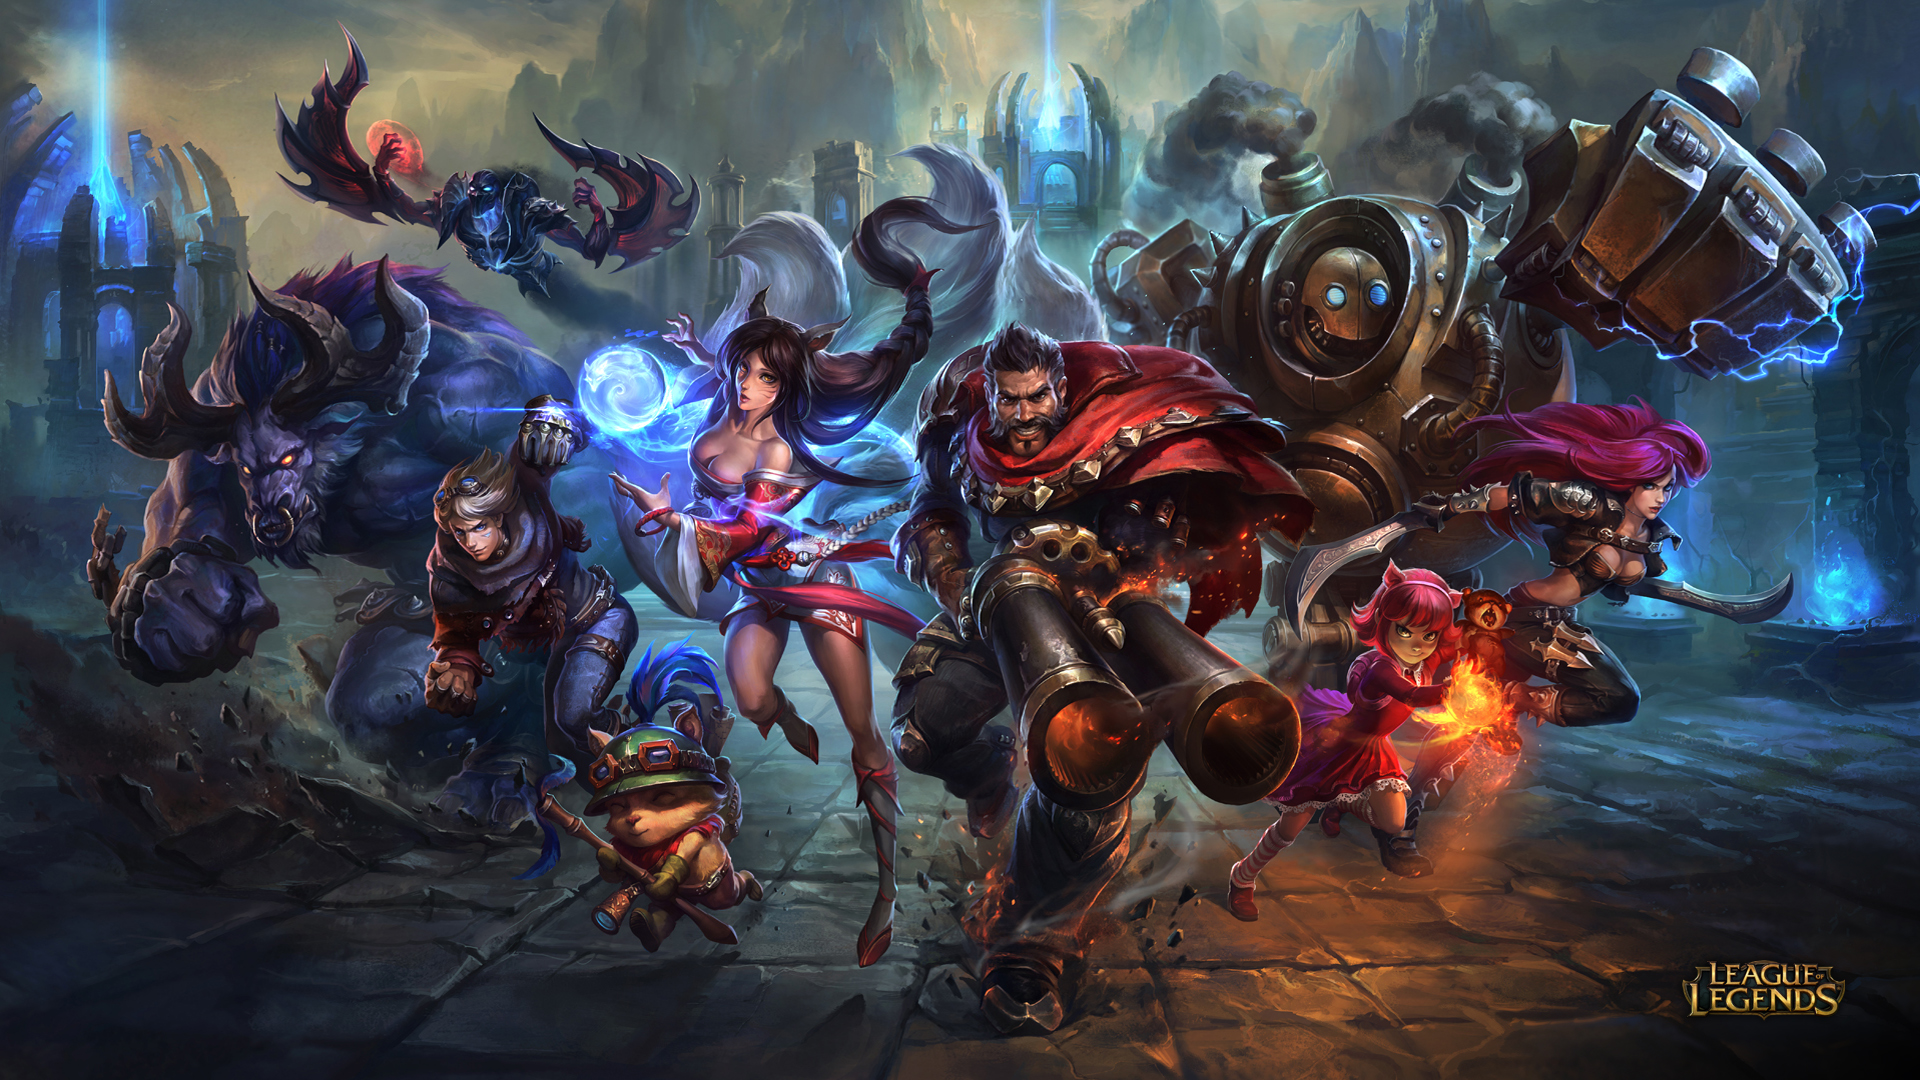 Wallpaper | League of Legends